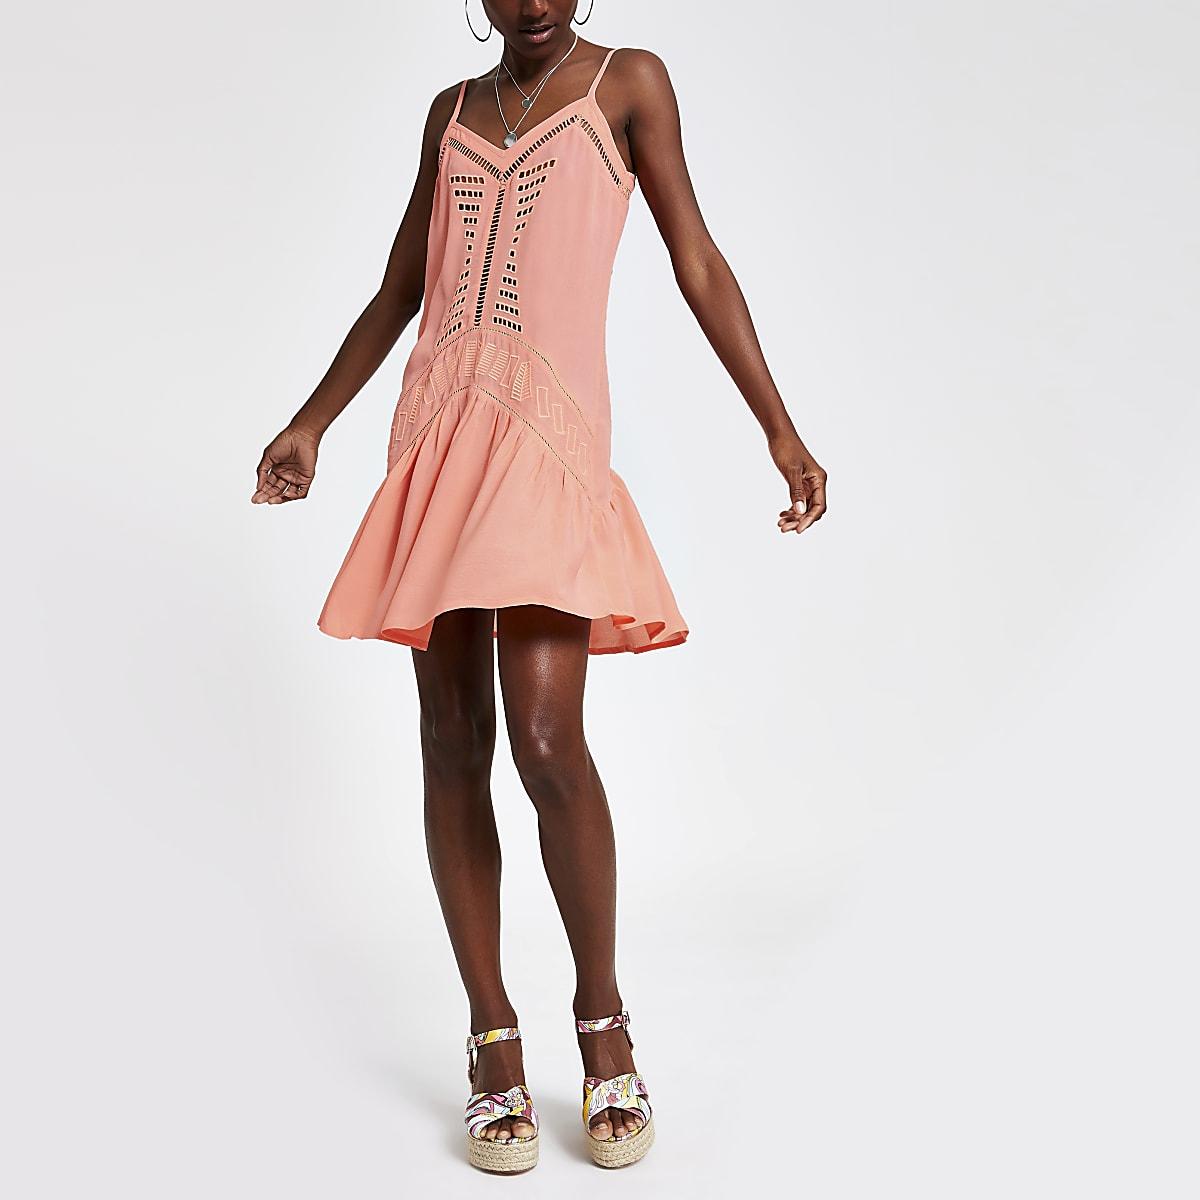 Neon pink cutout slip dress